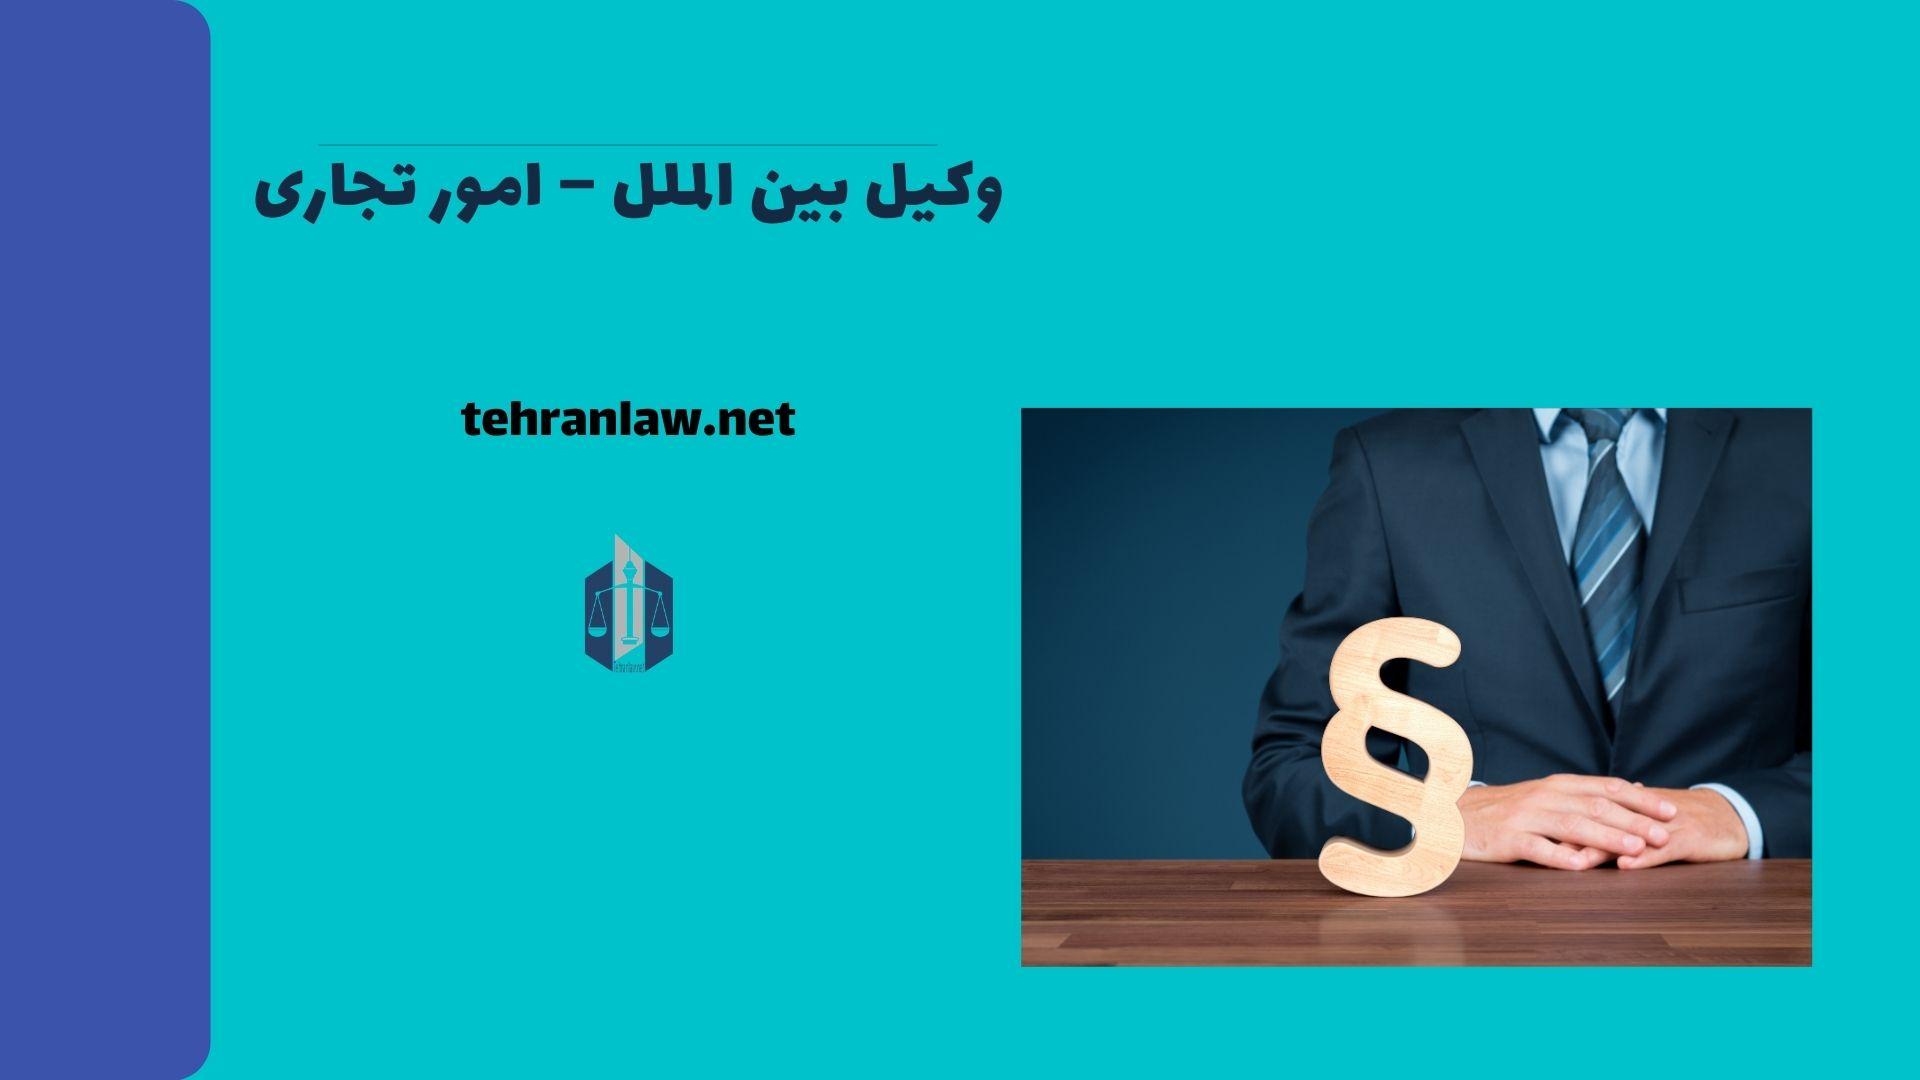 وکیل بین الملل – امور تجاری